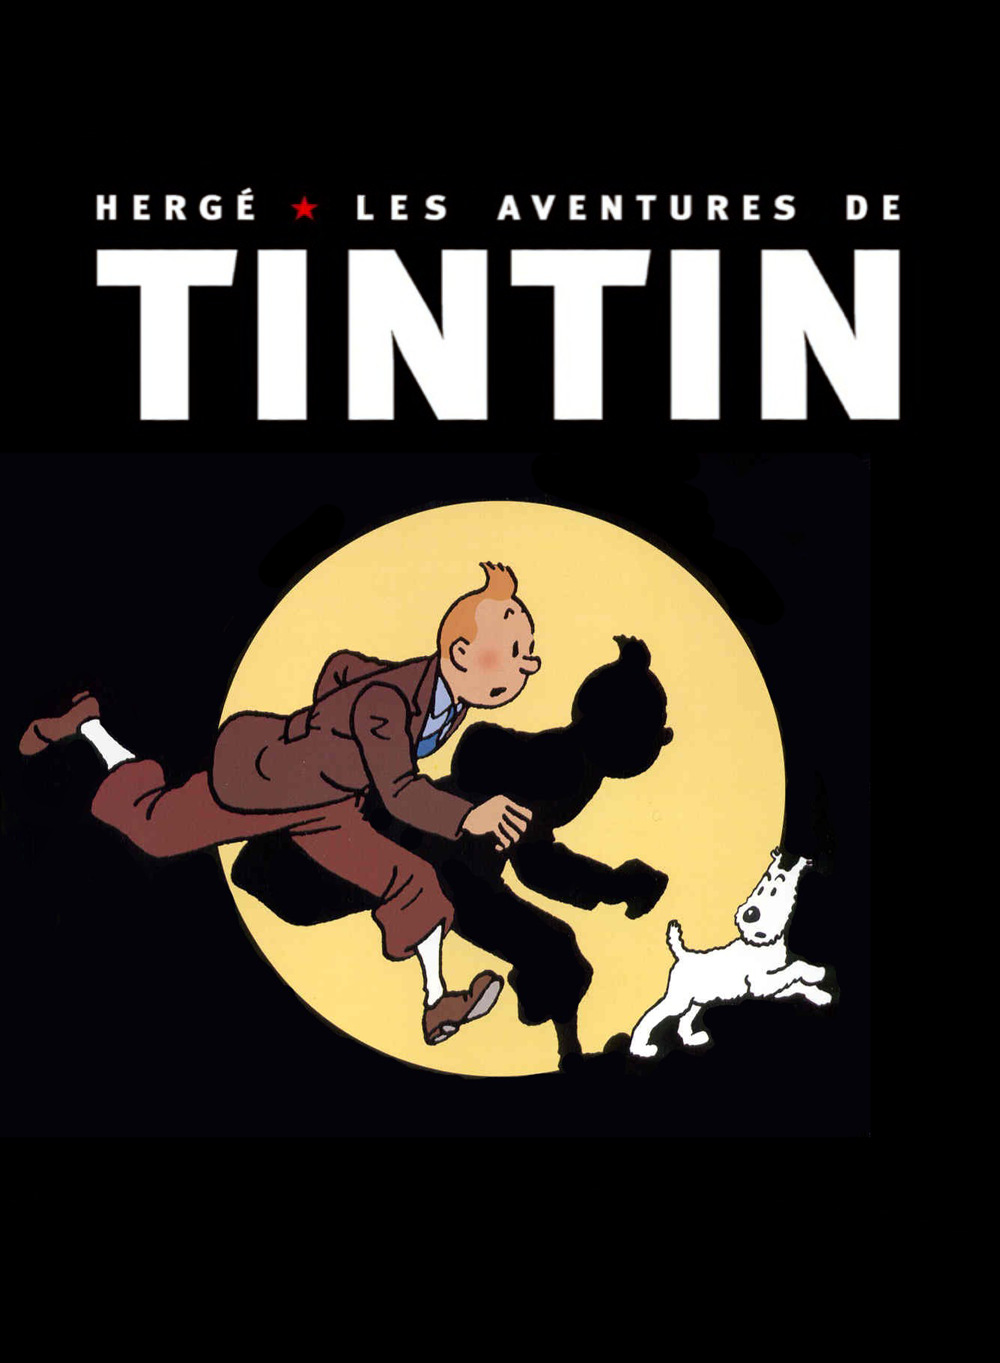 Les aventures de tintin Hergé